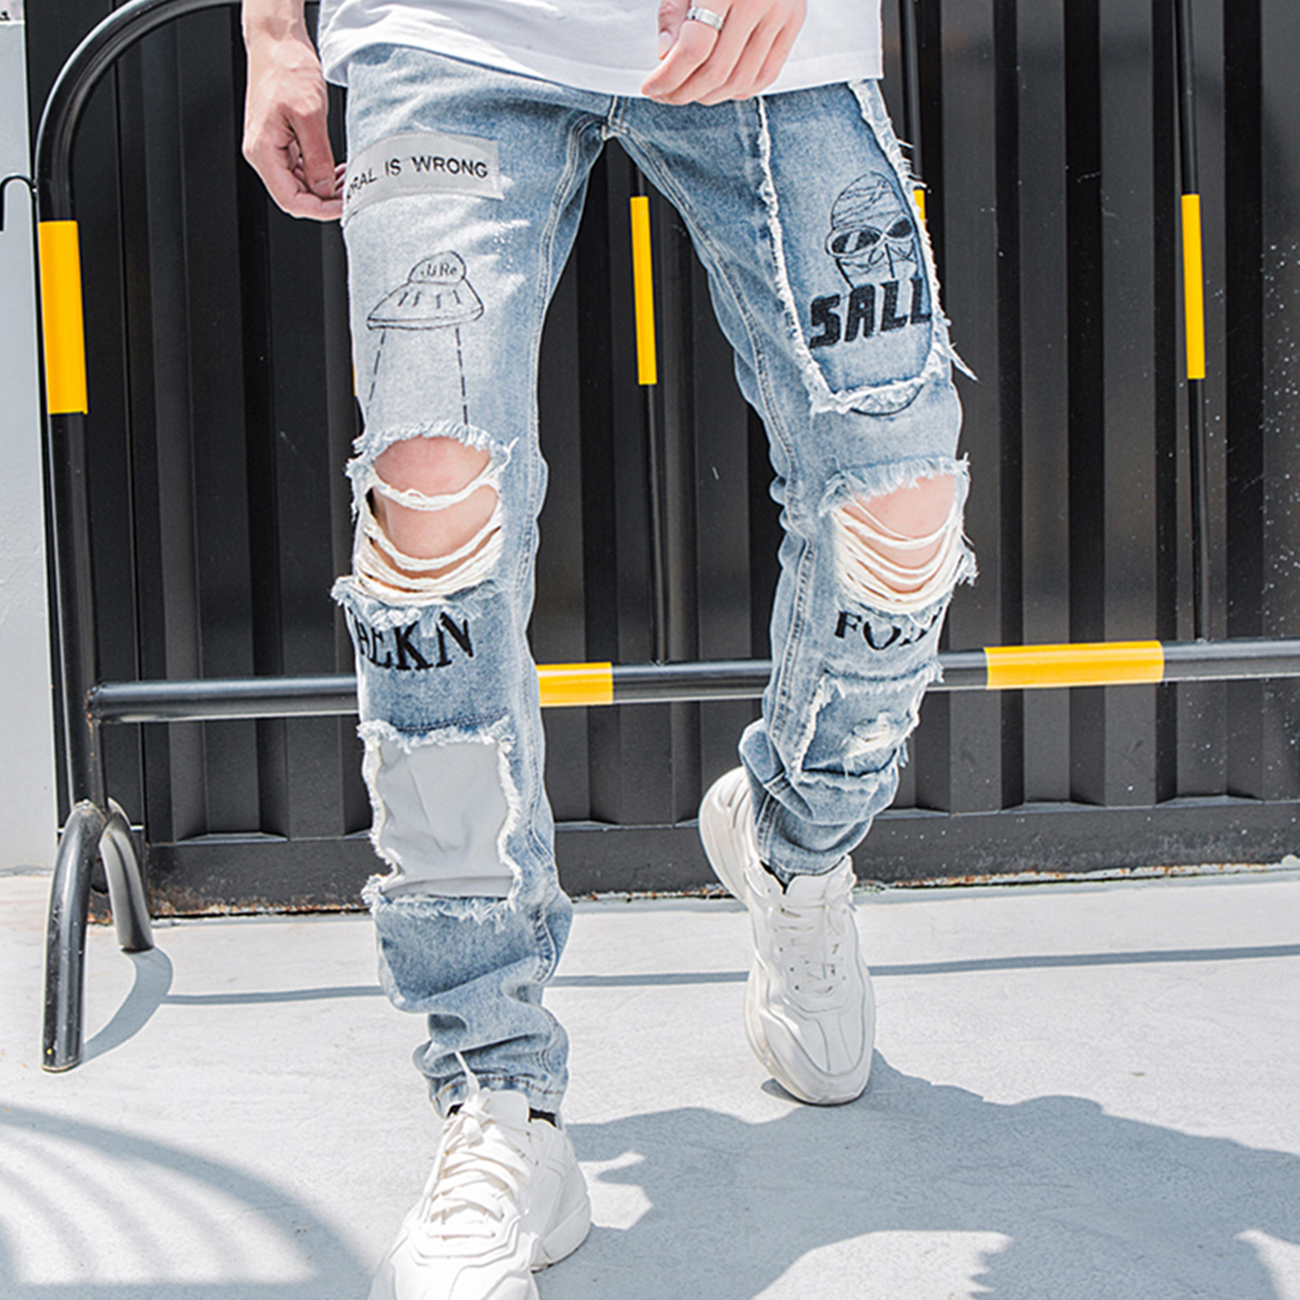 LACIBLE Reflective Men Hip Hop Jeans Skinny Ripped Vintage Biker Jogger Distressed Hole Baggy Denim Slim Fit Casual Pants